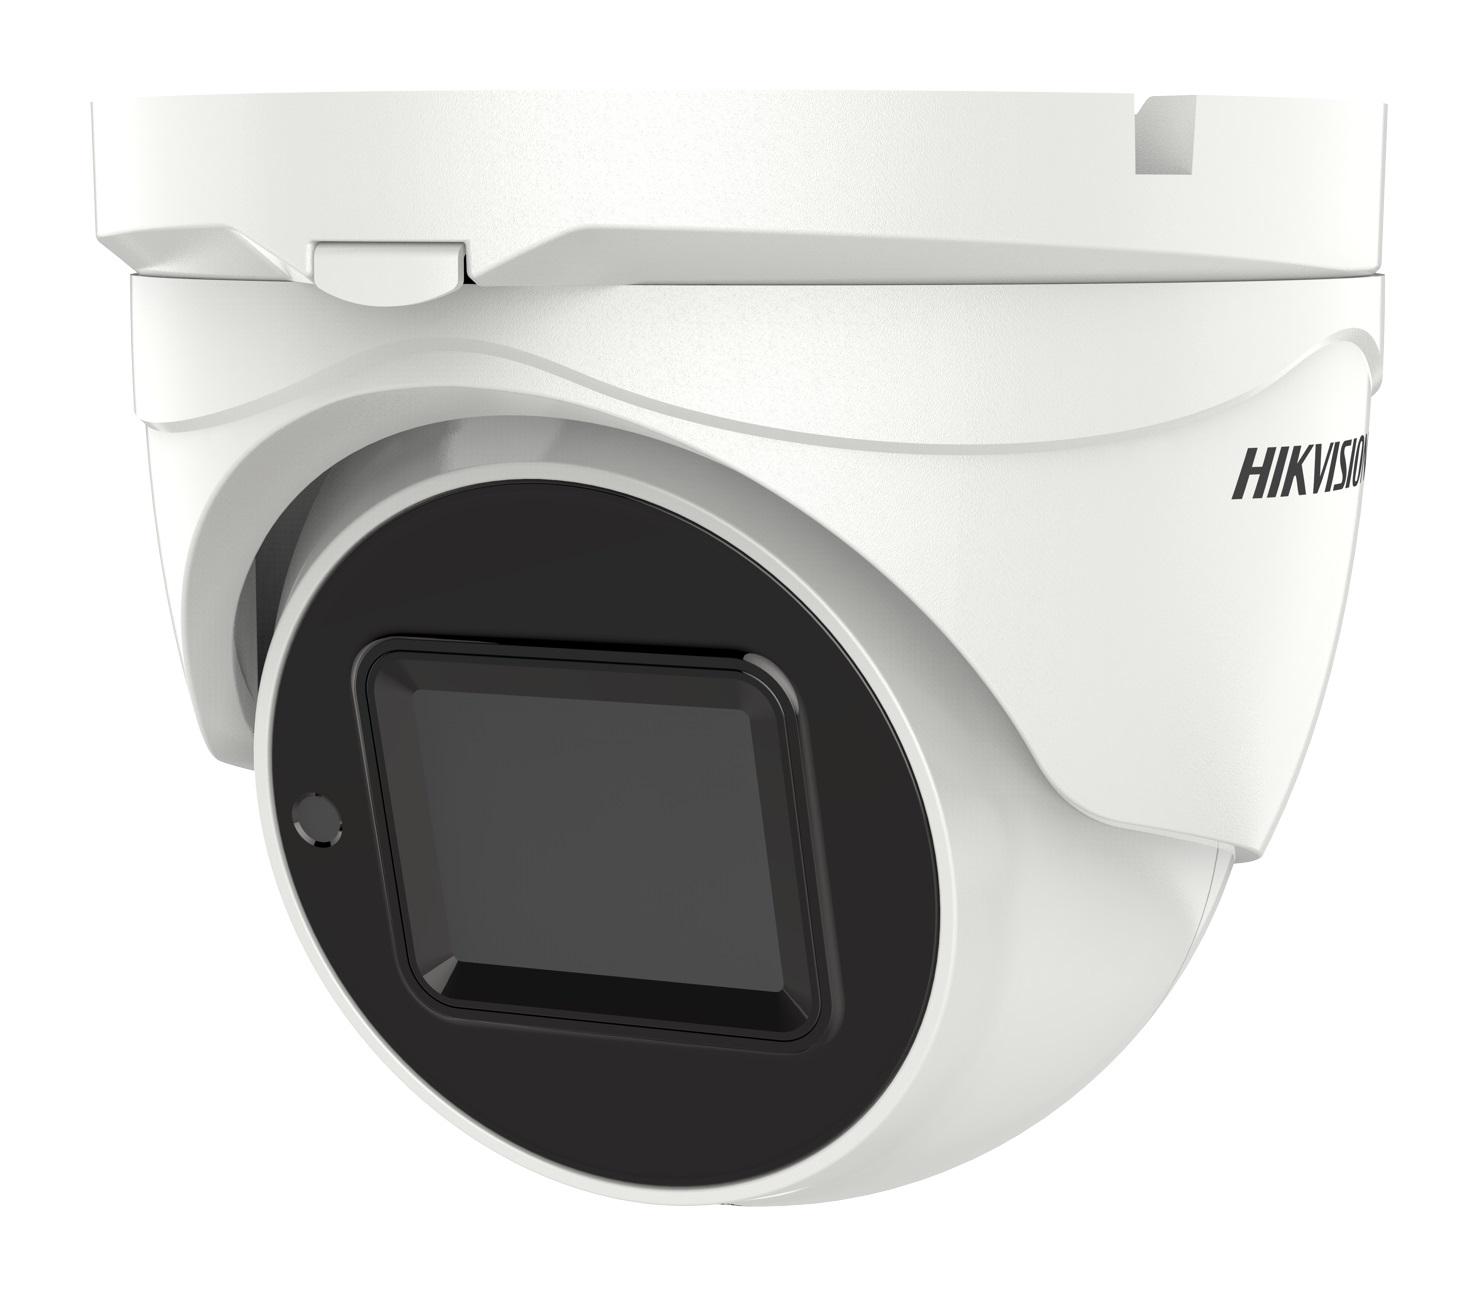 Hikvision 5MP motorized varifocal lens PoC turret camera